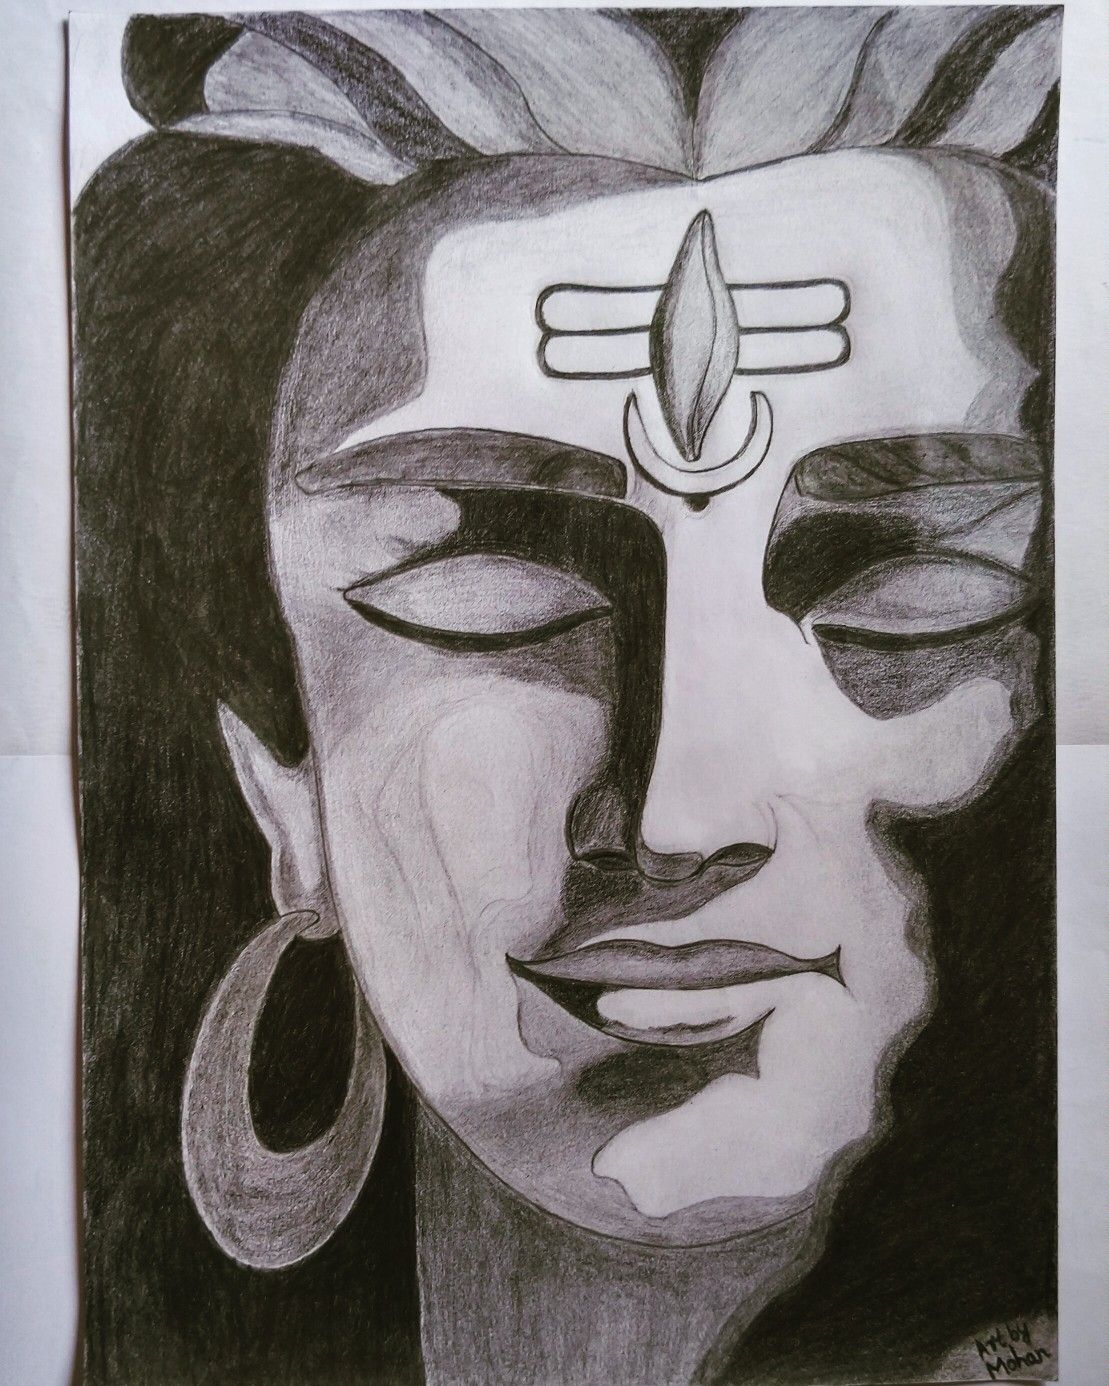 Lord Shiva Pencil Sketch Pencil Sketch Images Pencil Drawing Images Lord Shiva Painting